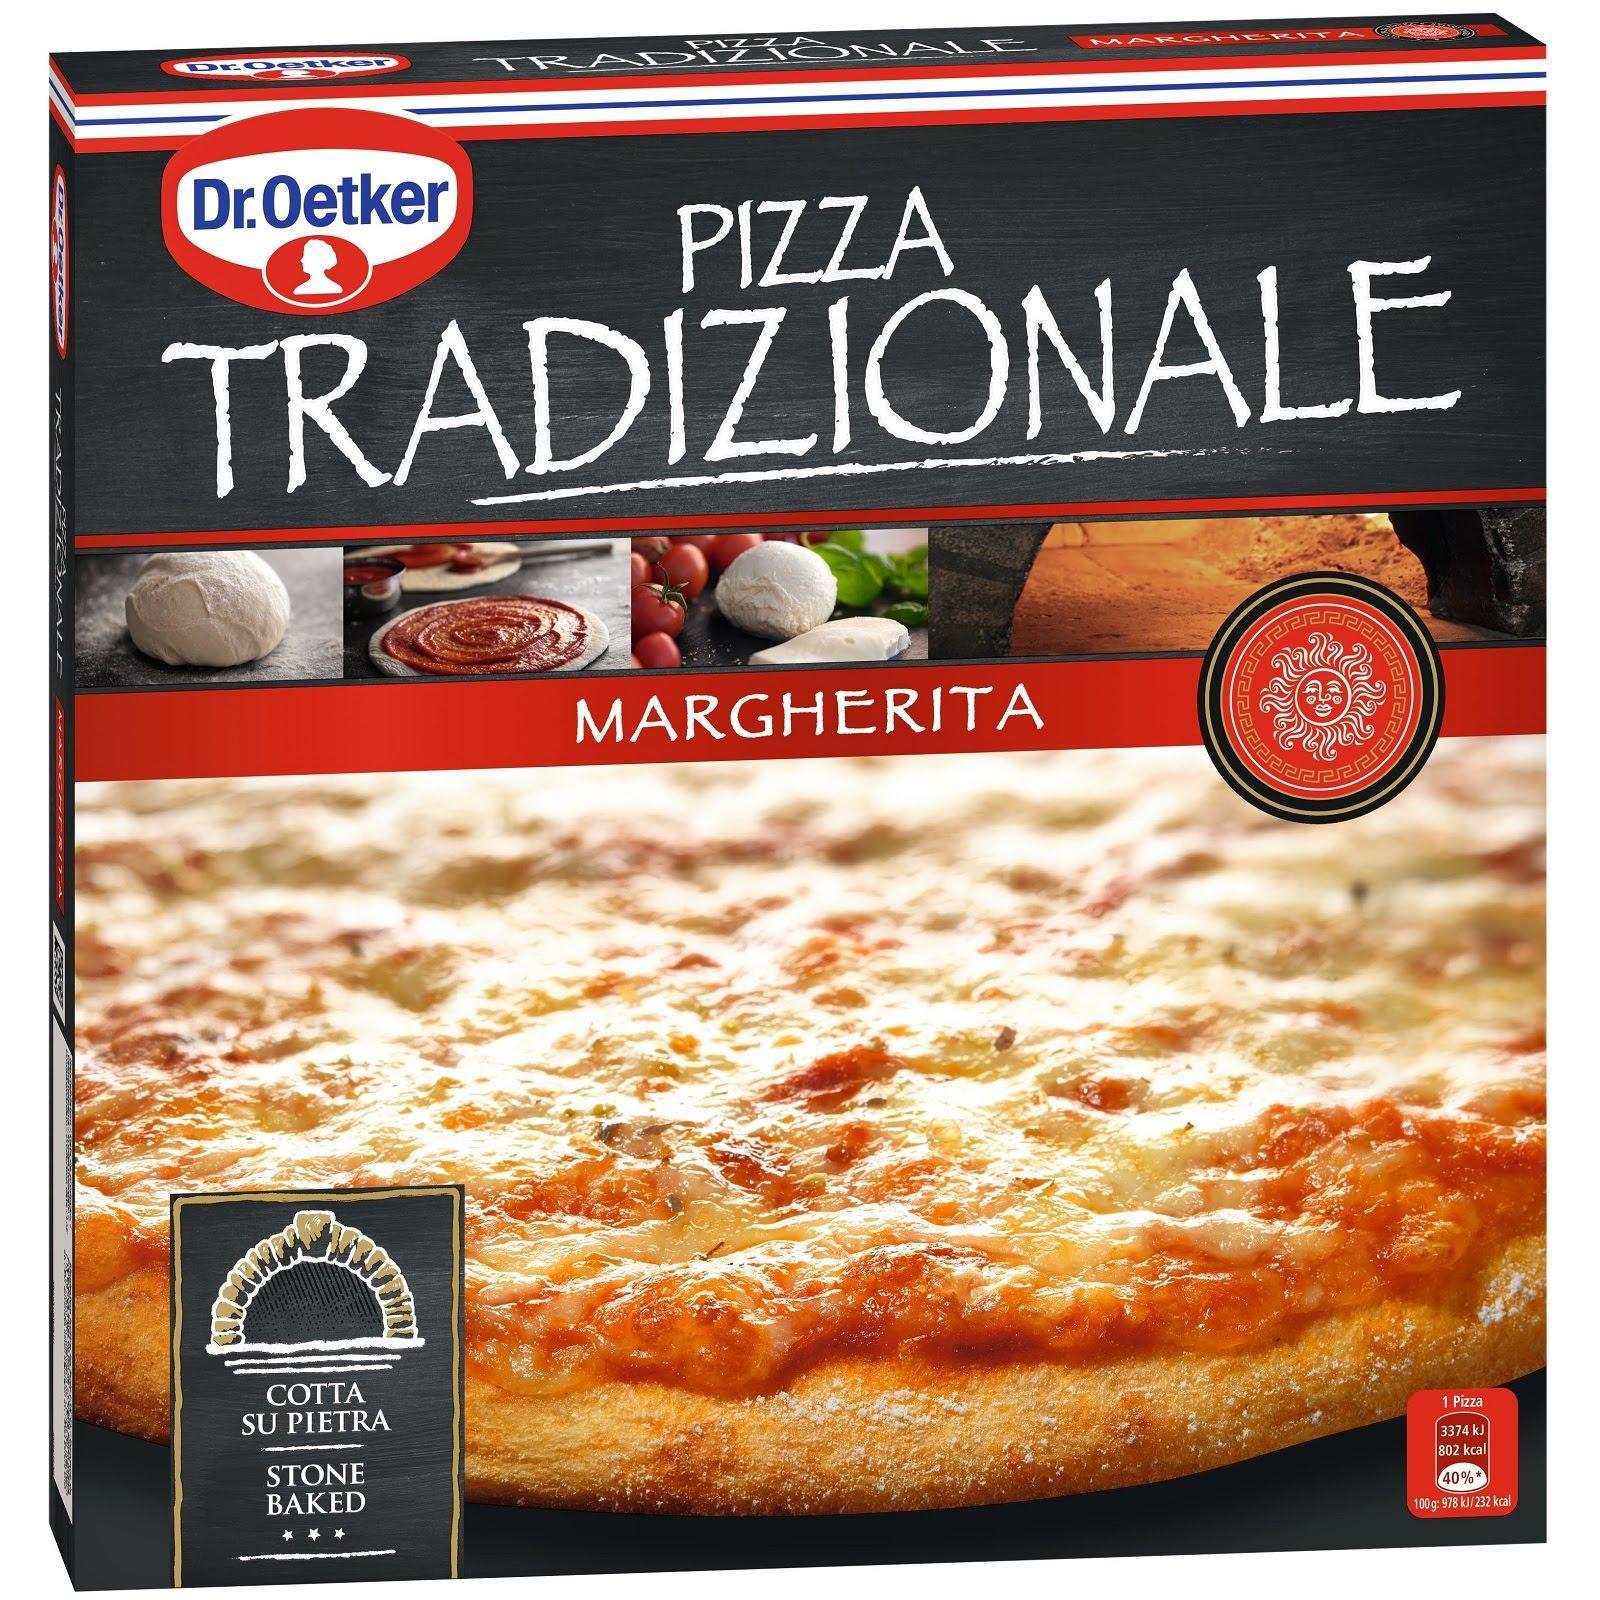 Dr Oetker Tradizionale Margherita Pizza - Frozen